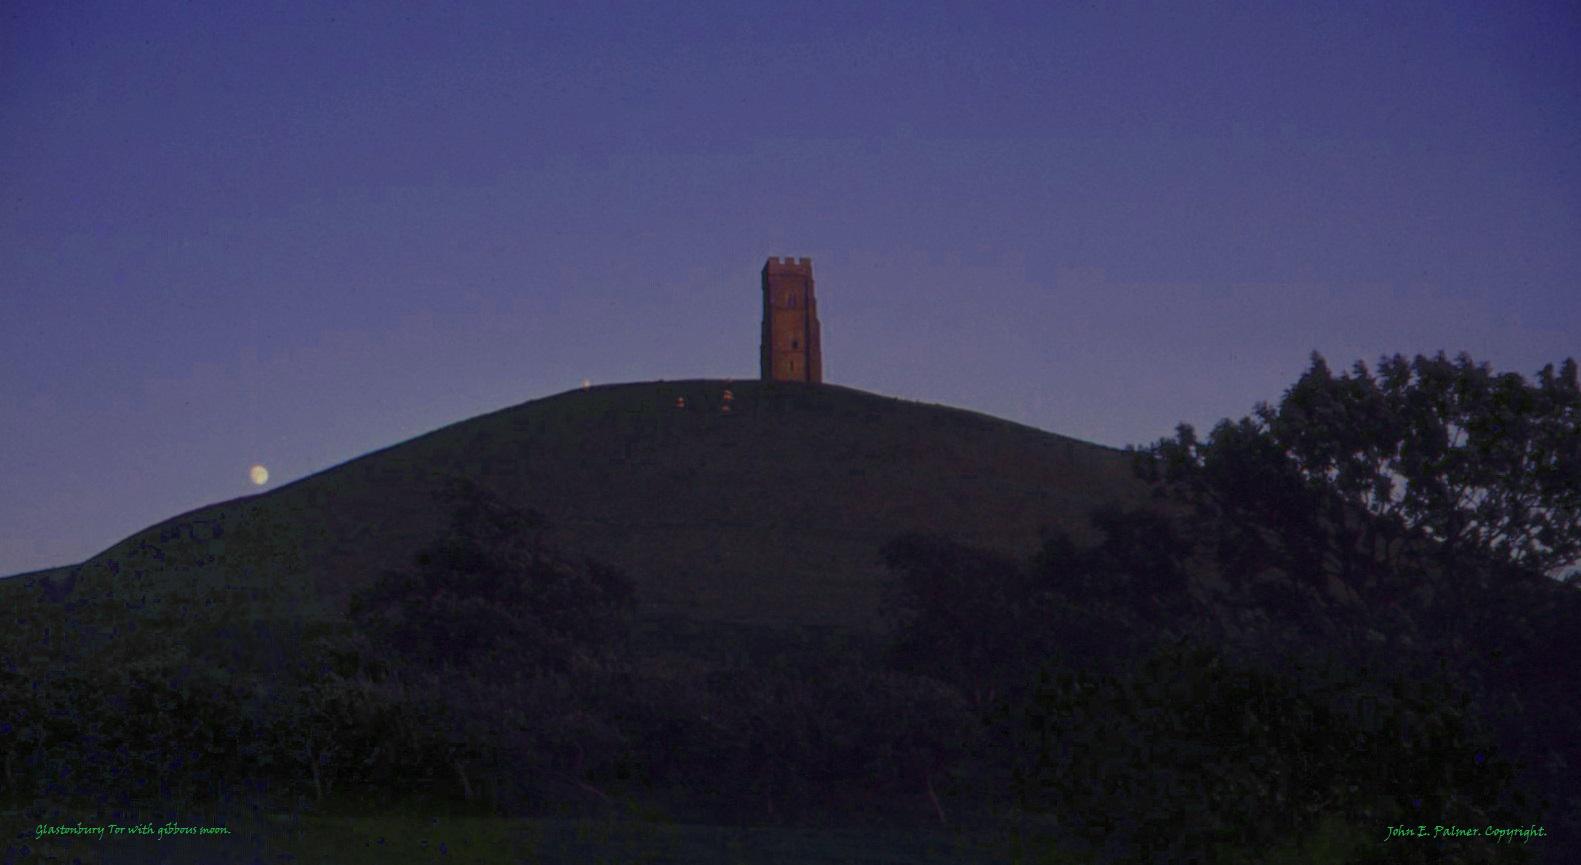 Glastonbury Tor with gibbous moon. (titled).